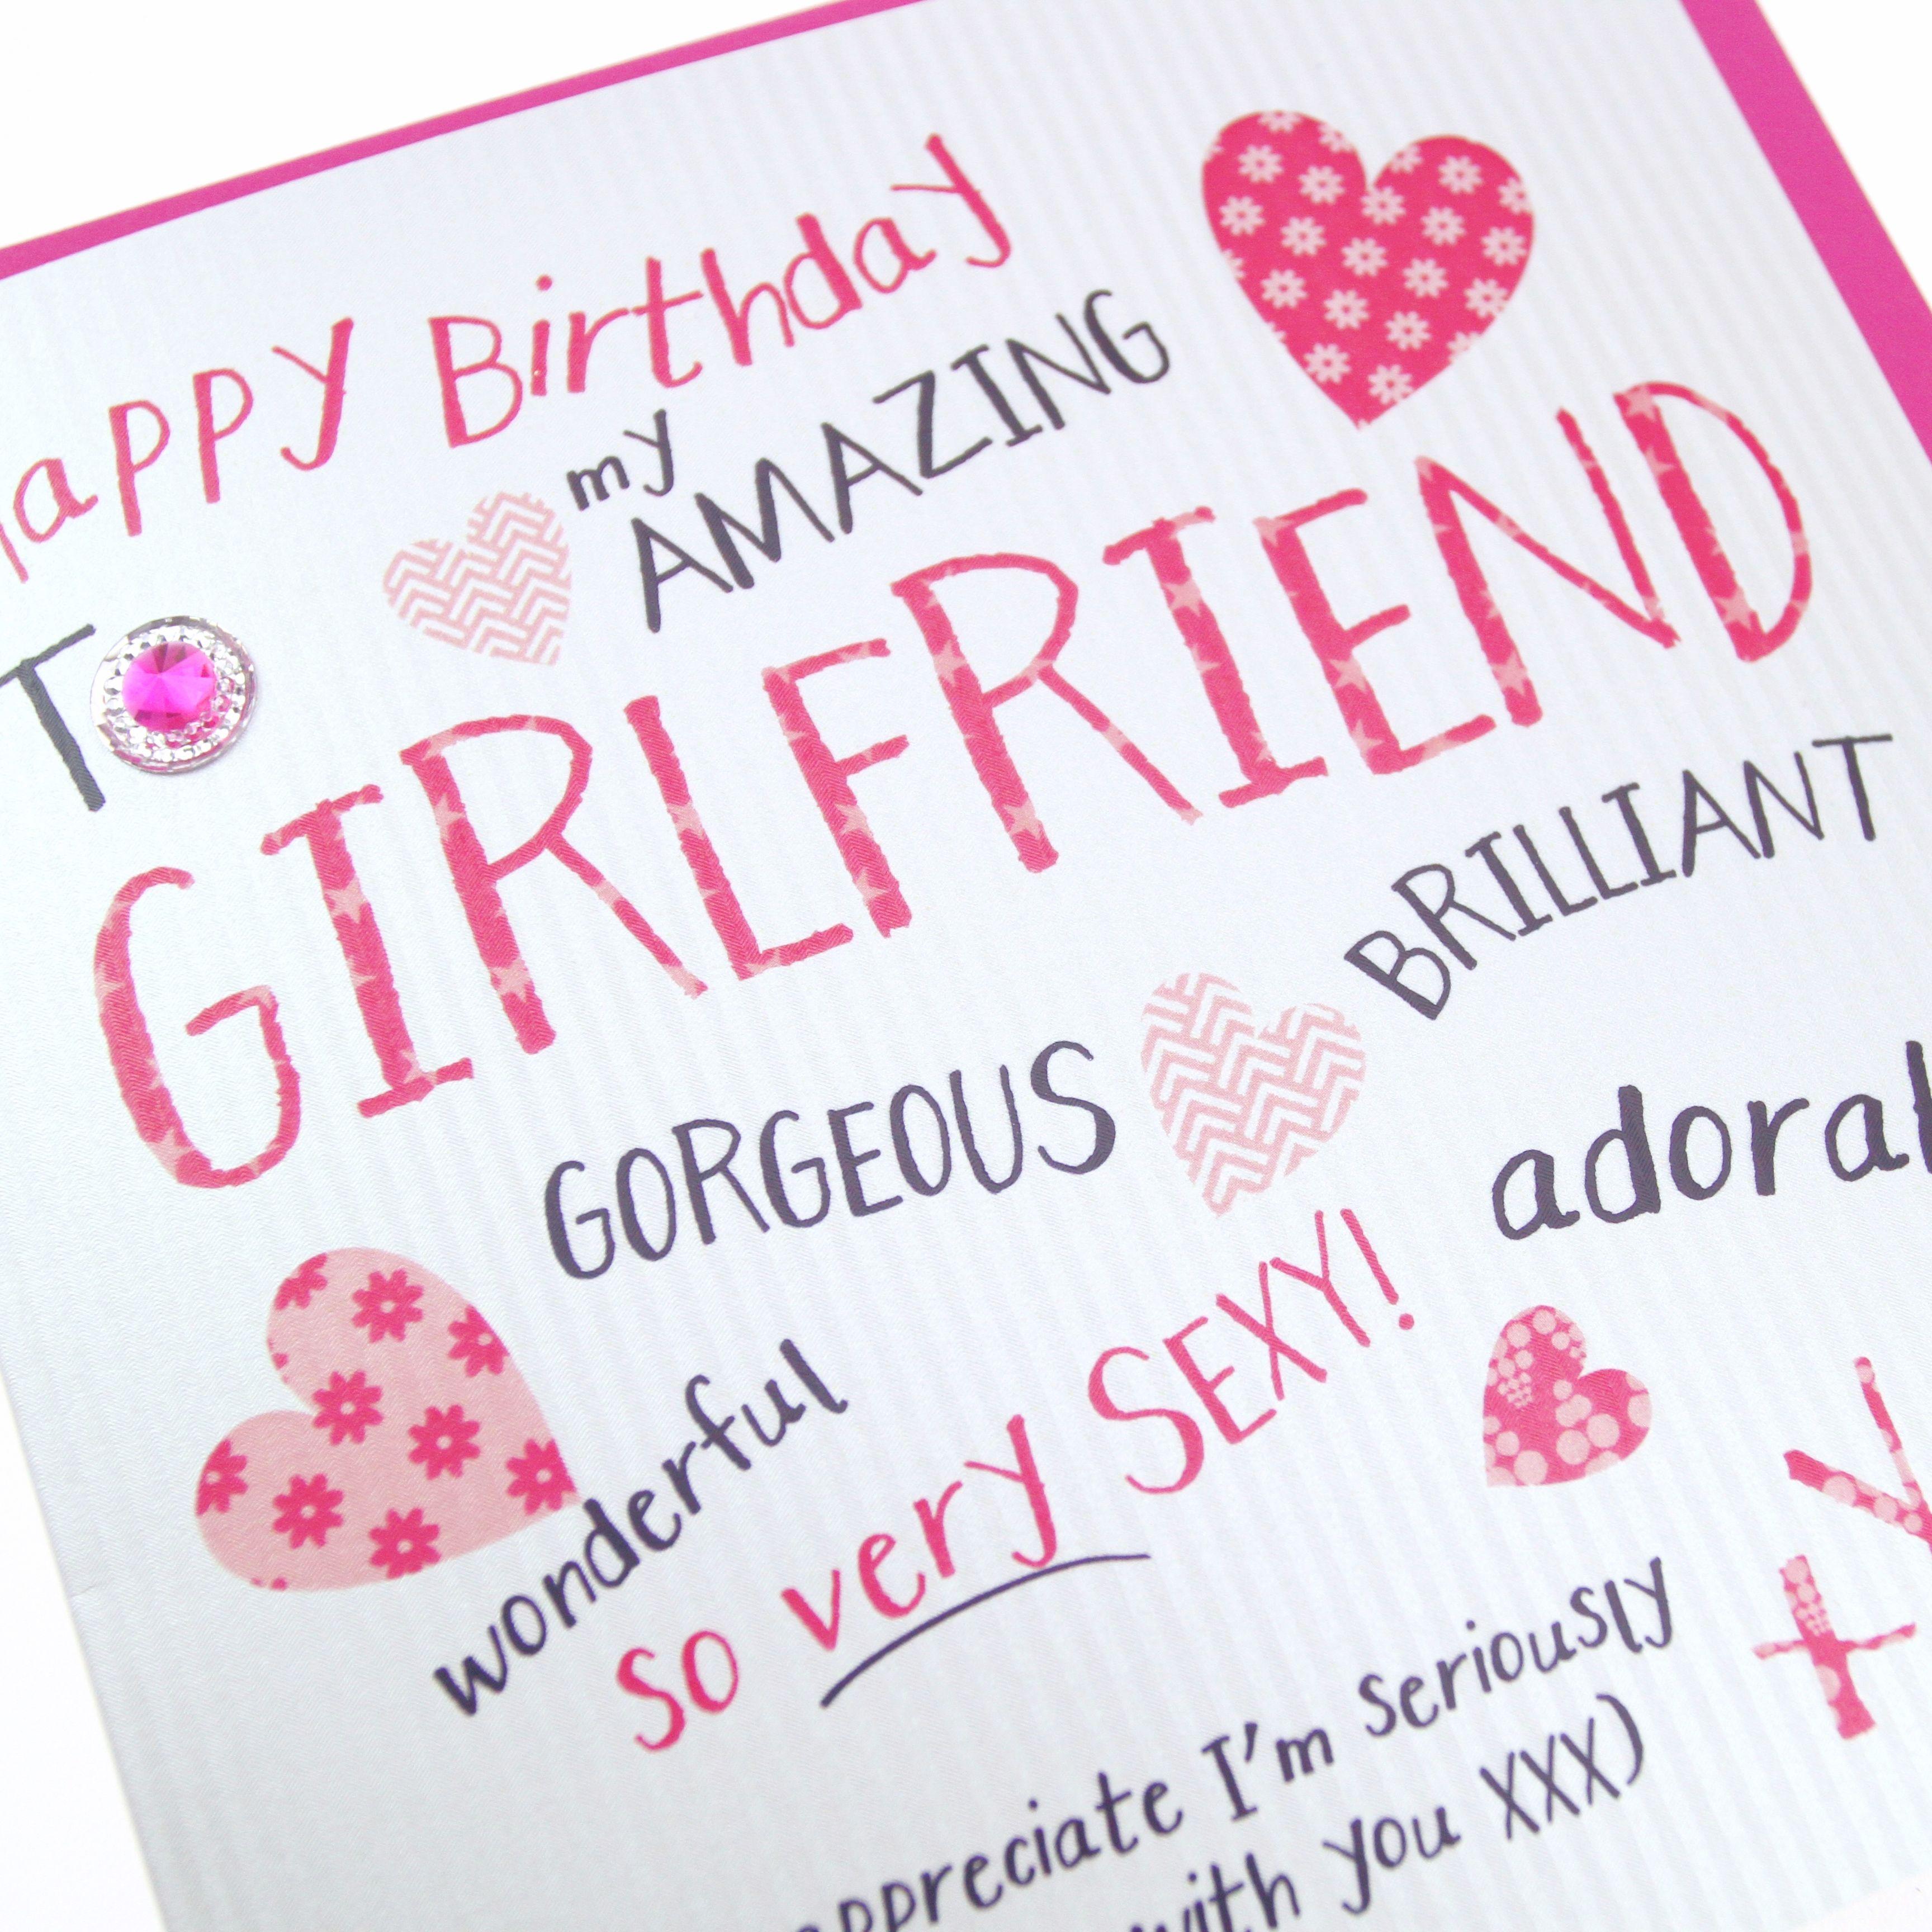 Handmade Hot Pink Womens Birthday Card Hearts Kisses Gorgeous Brilliant Wonderful